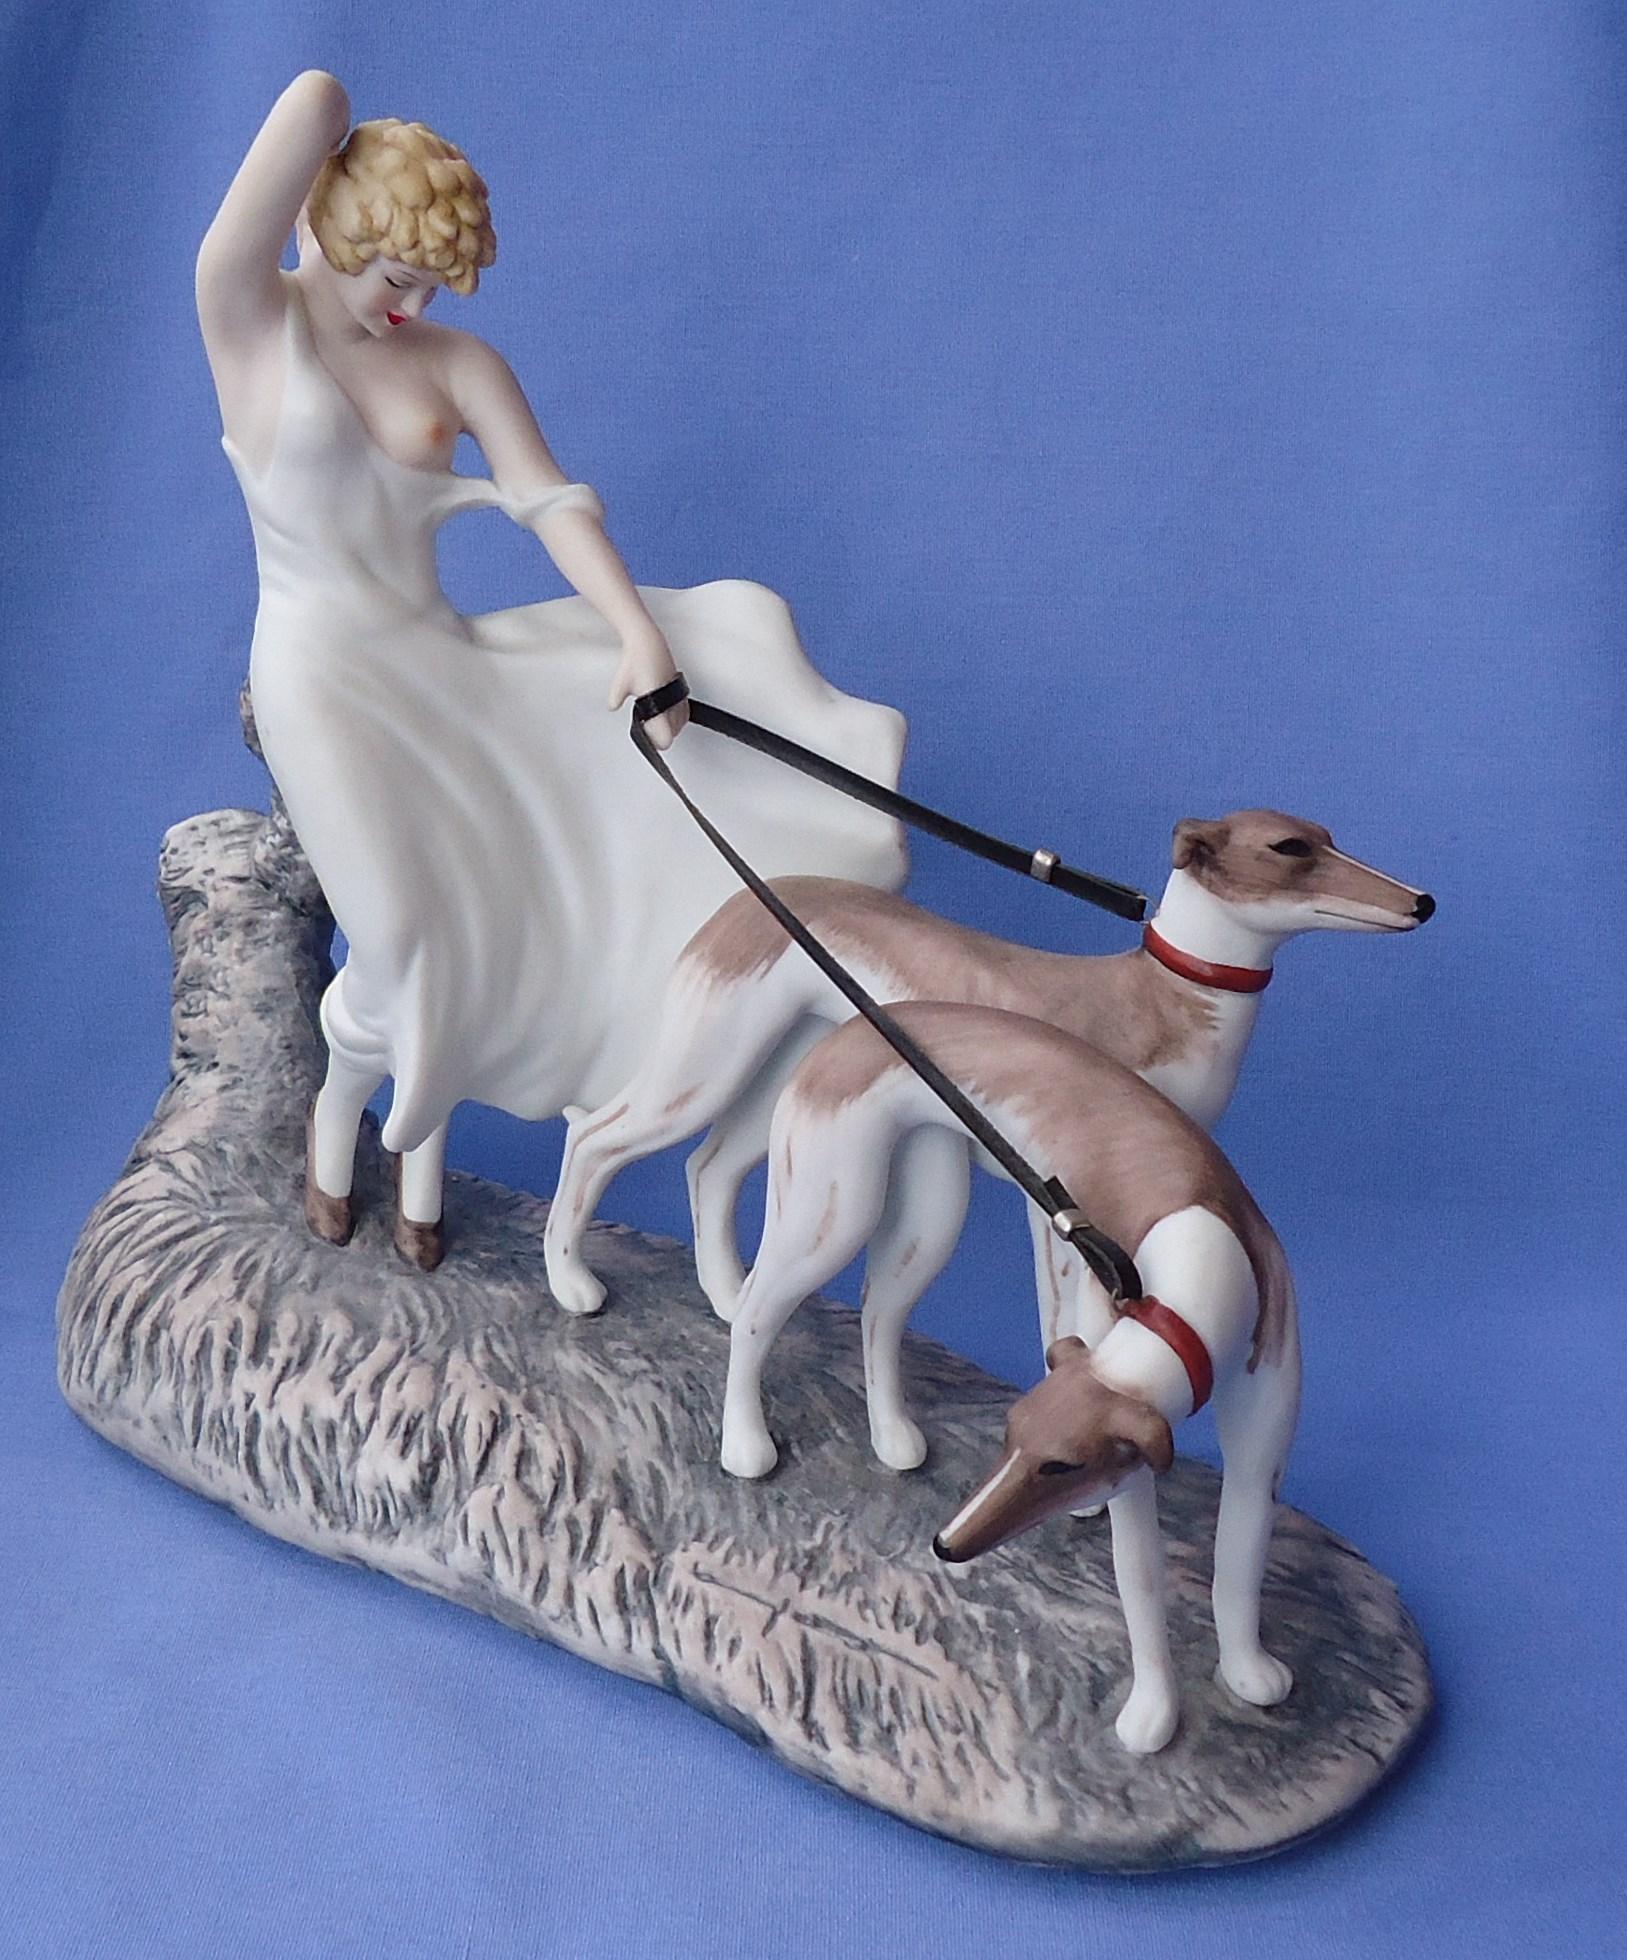 Icart art deco lady w Greyhounds figurine LE#1560